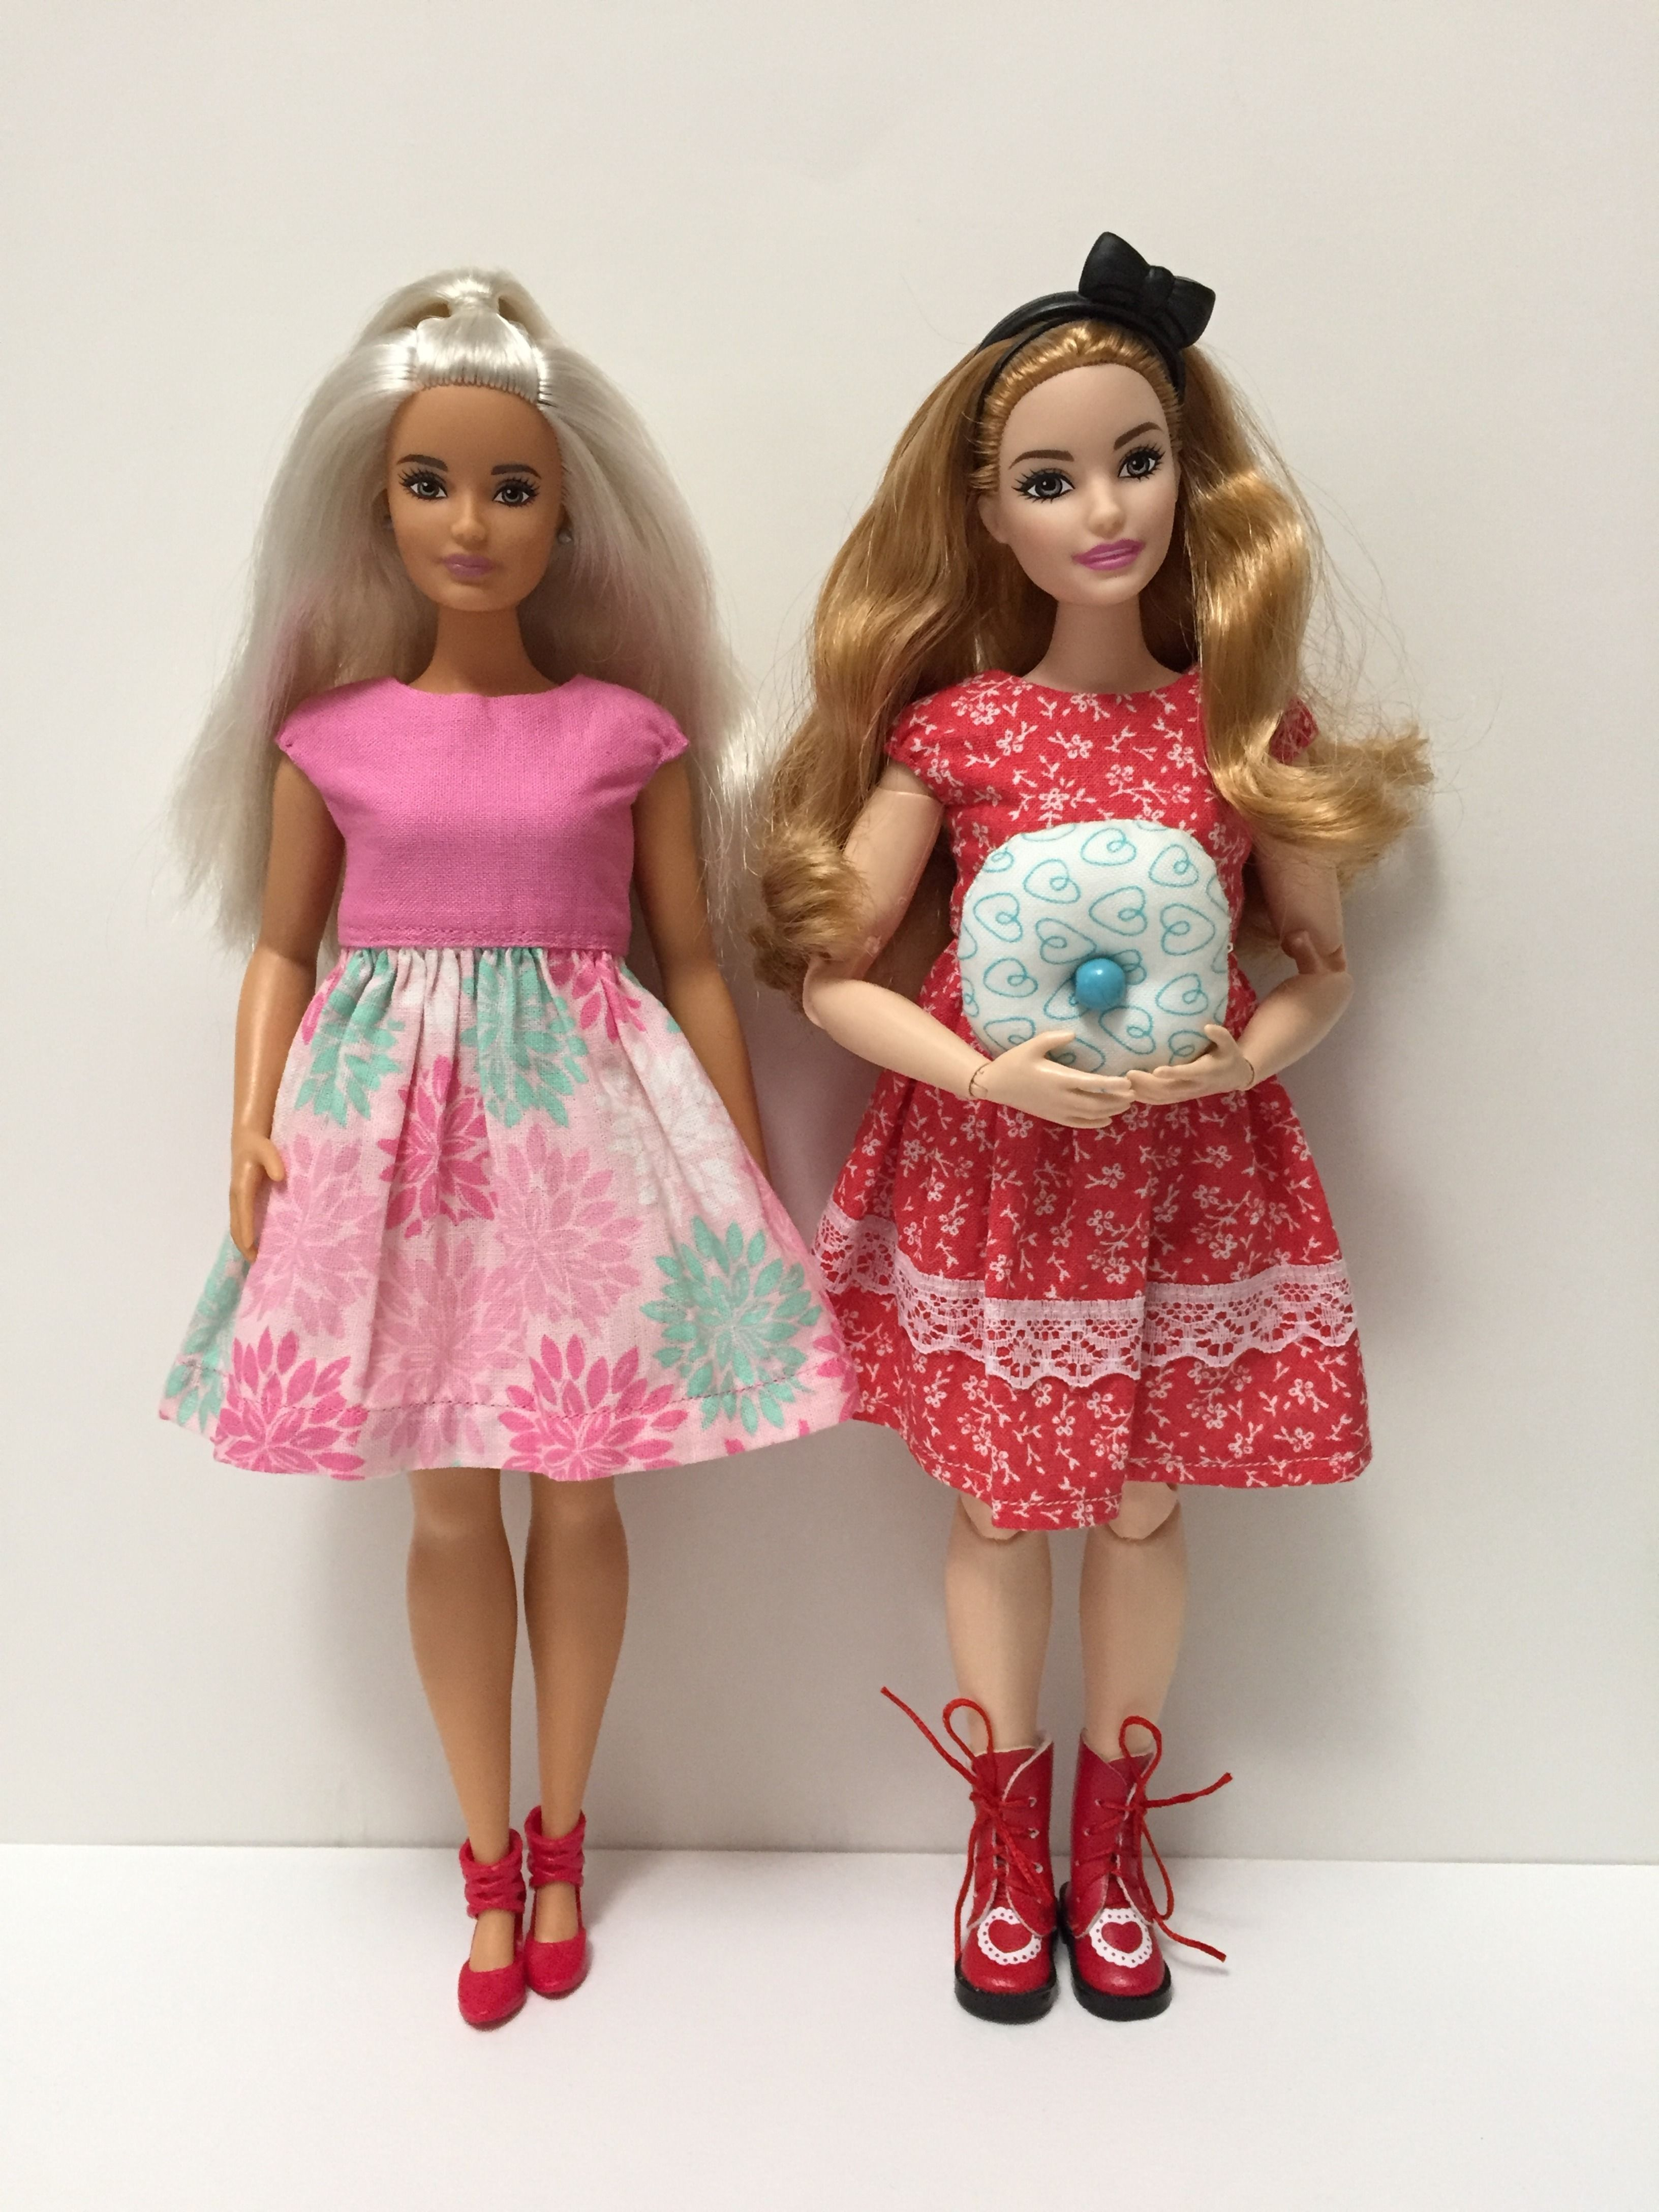 Curvy Barbie Made To Move Curvy Barbie Barbie Clothes Baby Girl Art